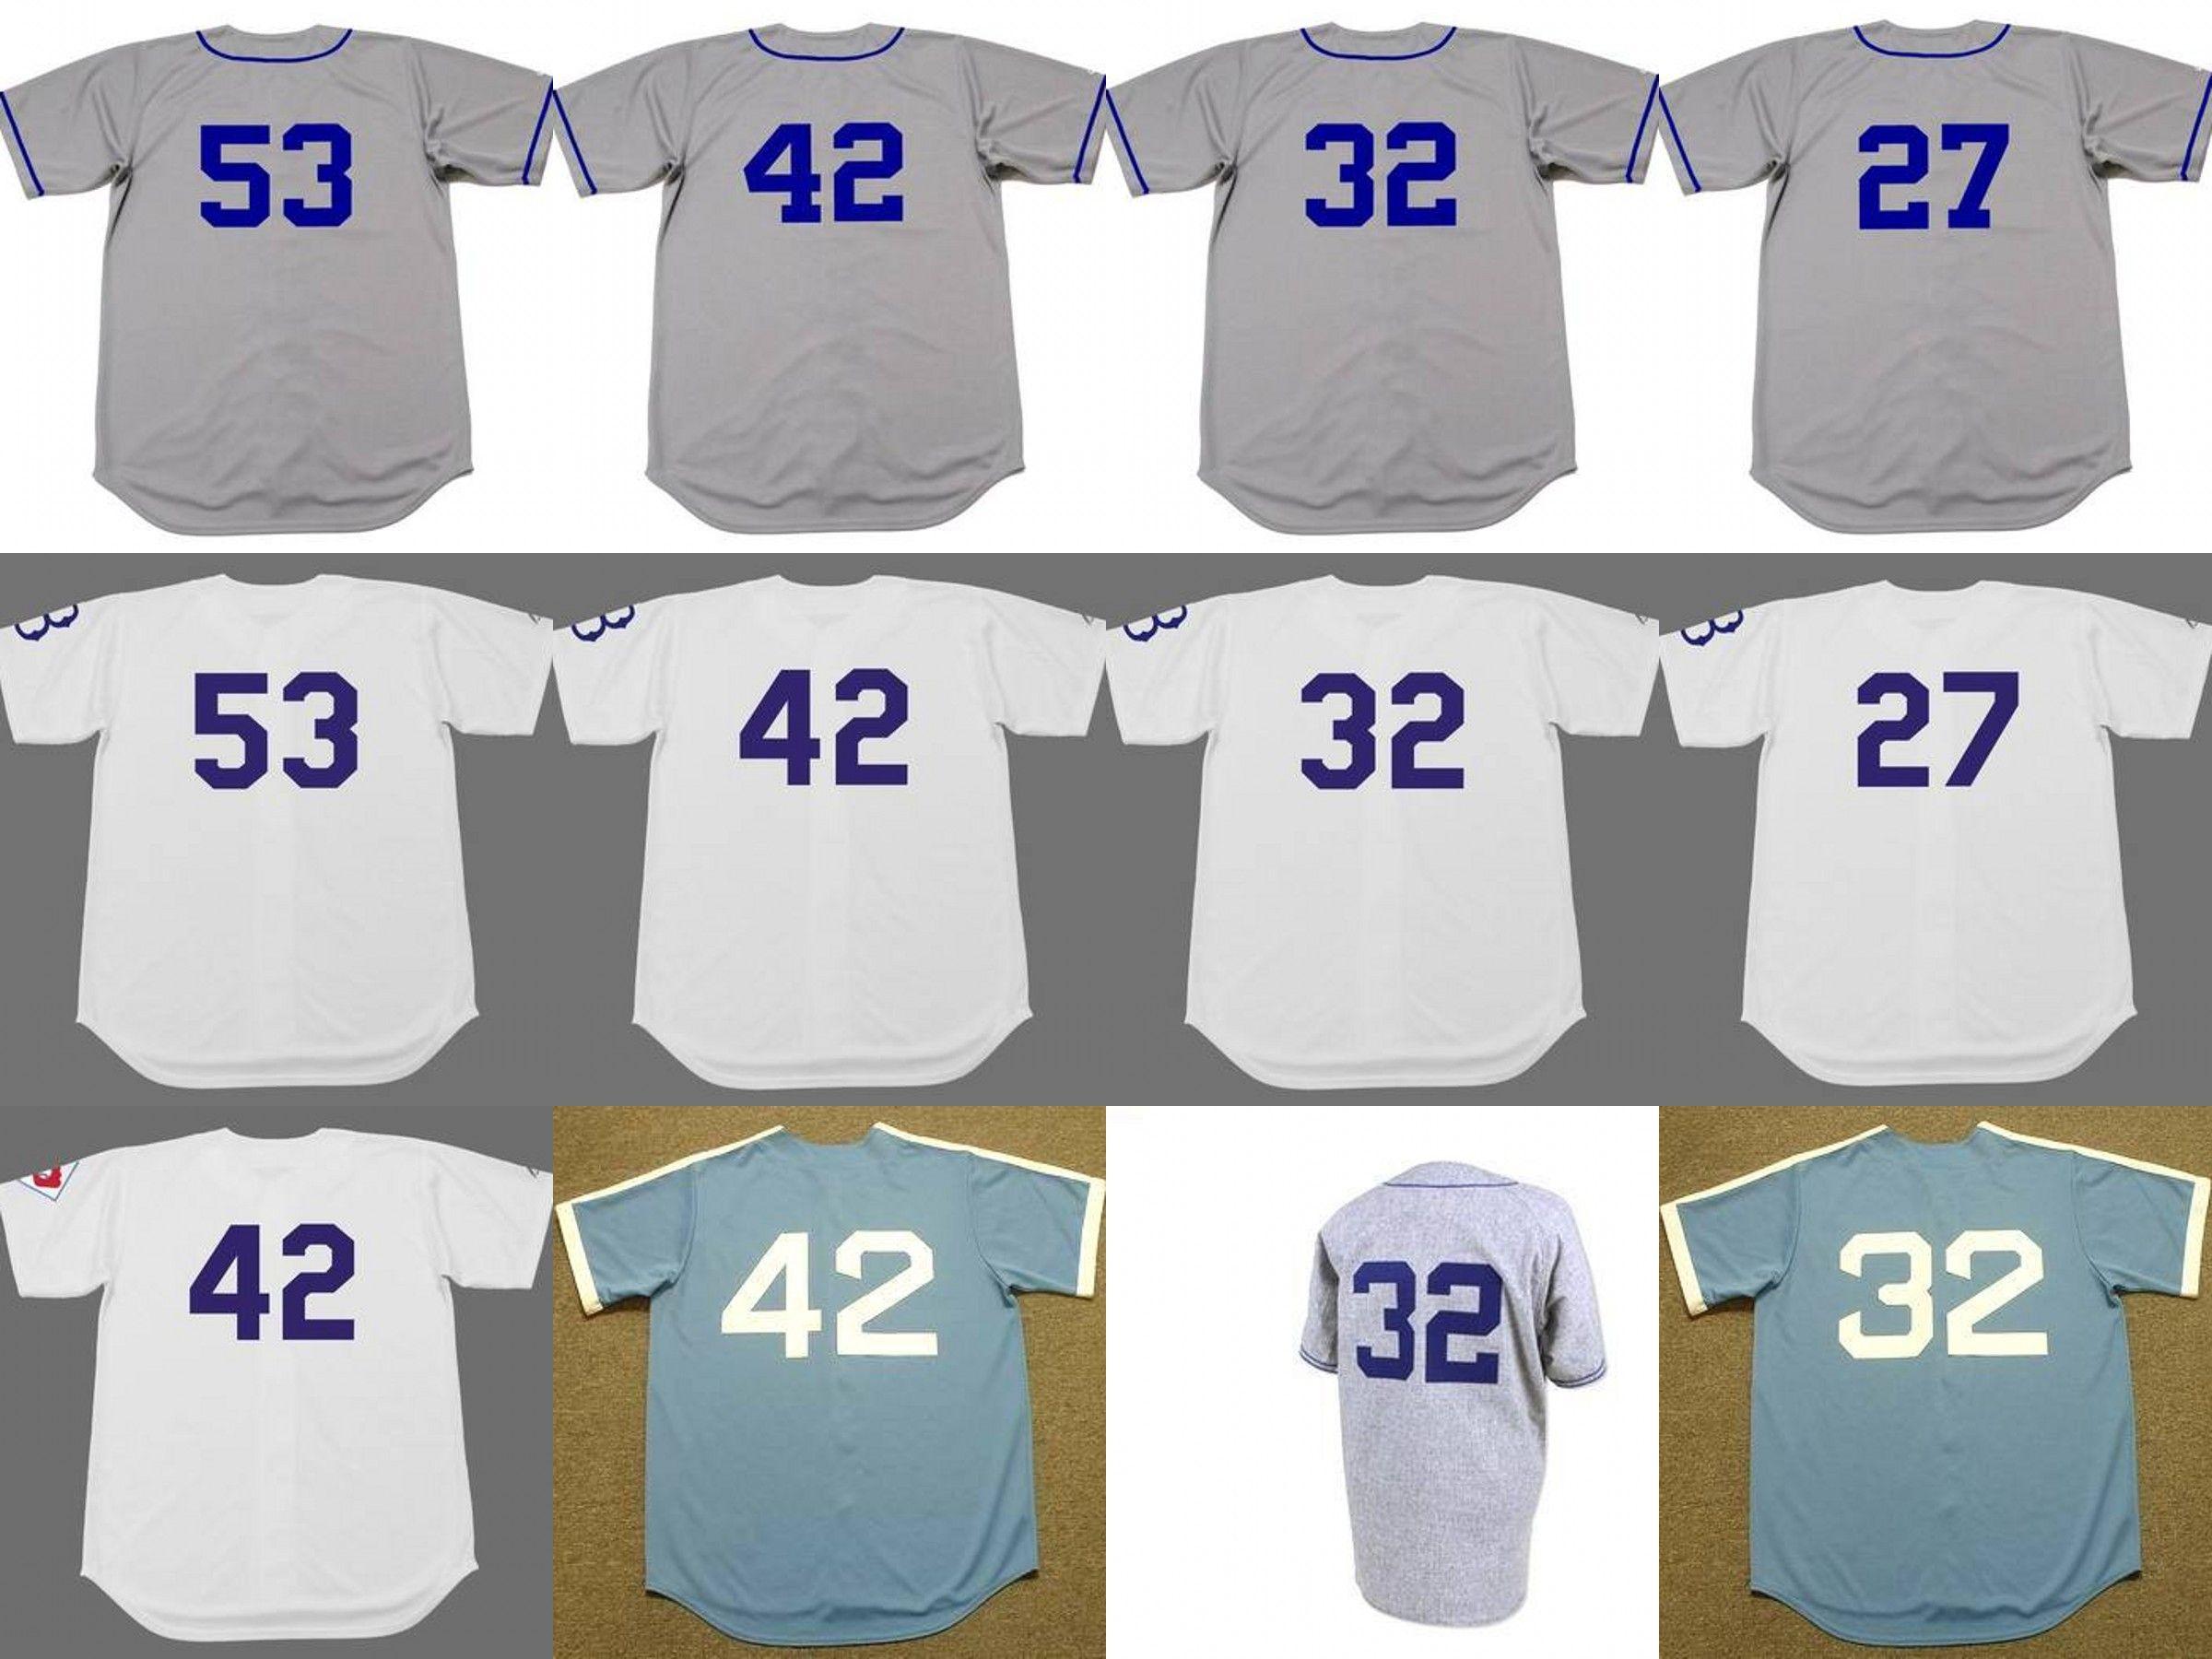 newest 0ace9 1cf34 men youth women BROOKLYN DODGERS 53 DON DRYSDALE 27 TOMMY LASORDA 32 SANDY  KOUFAX 42 ROBINSON Baseball Jersey